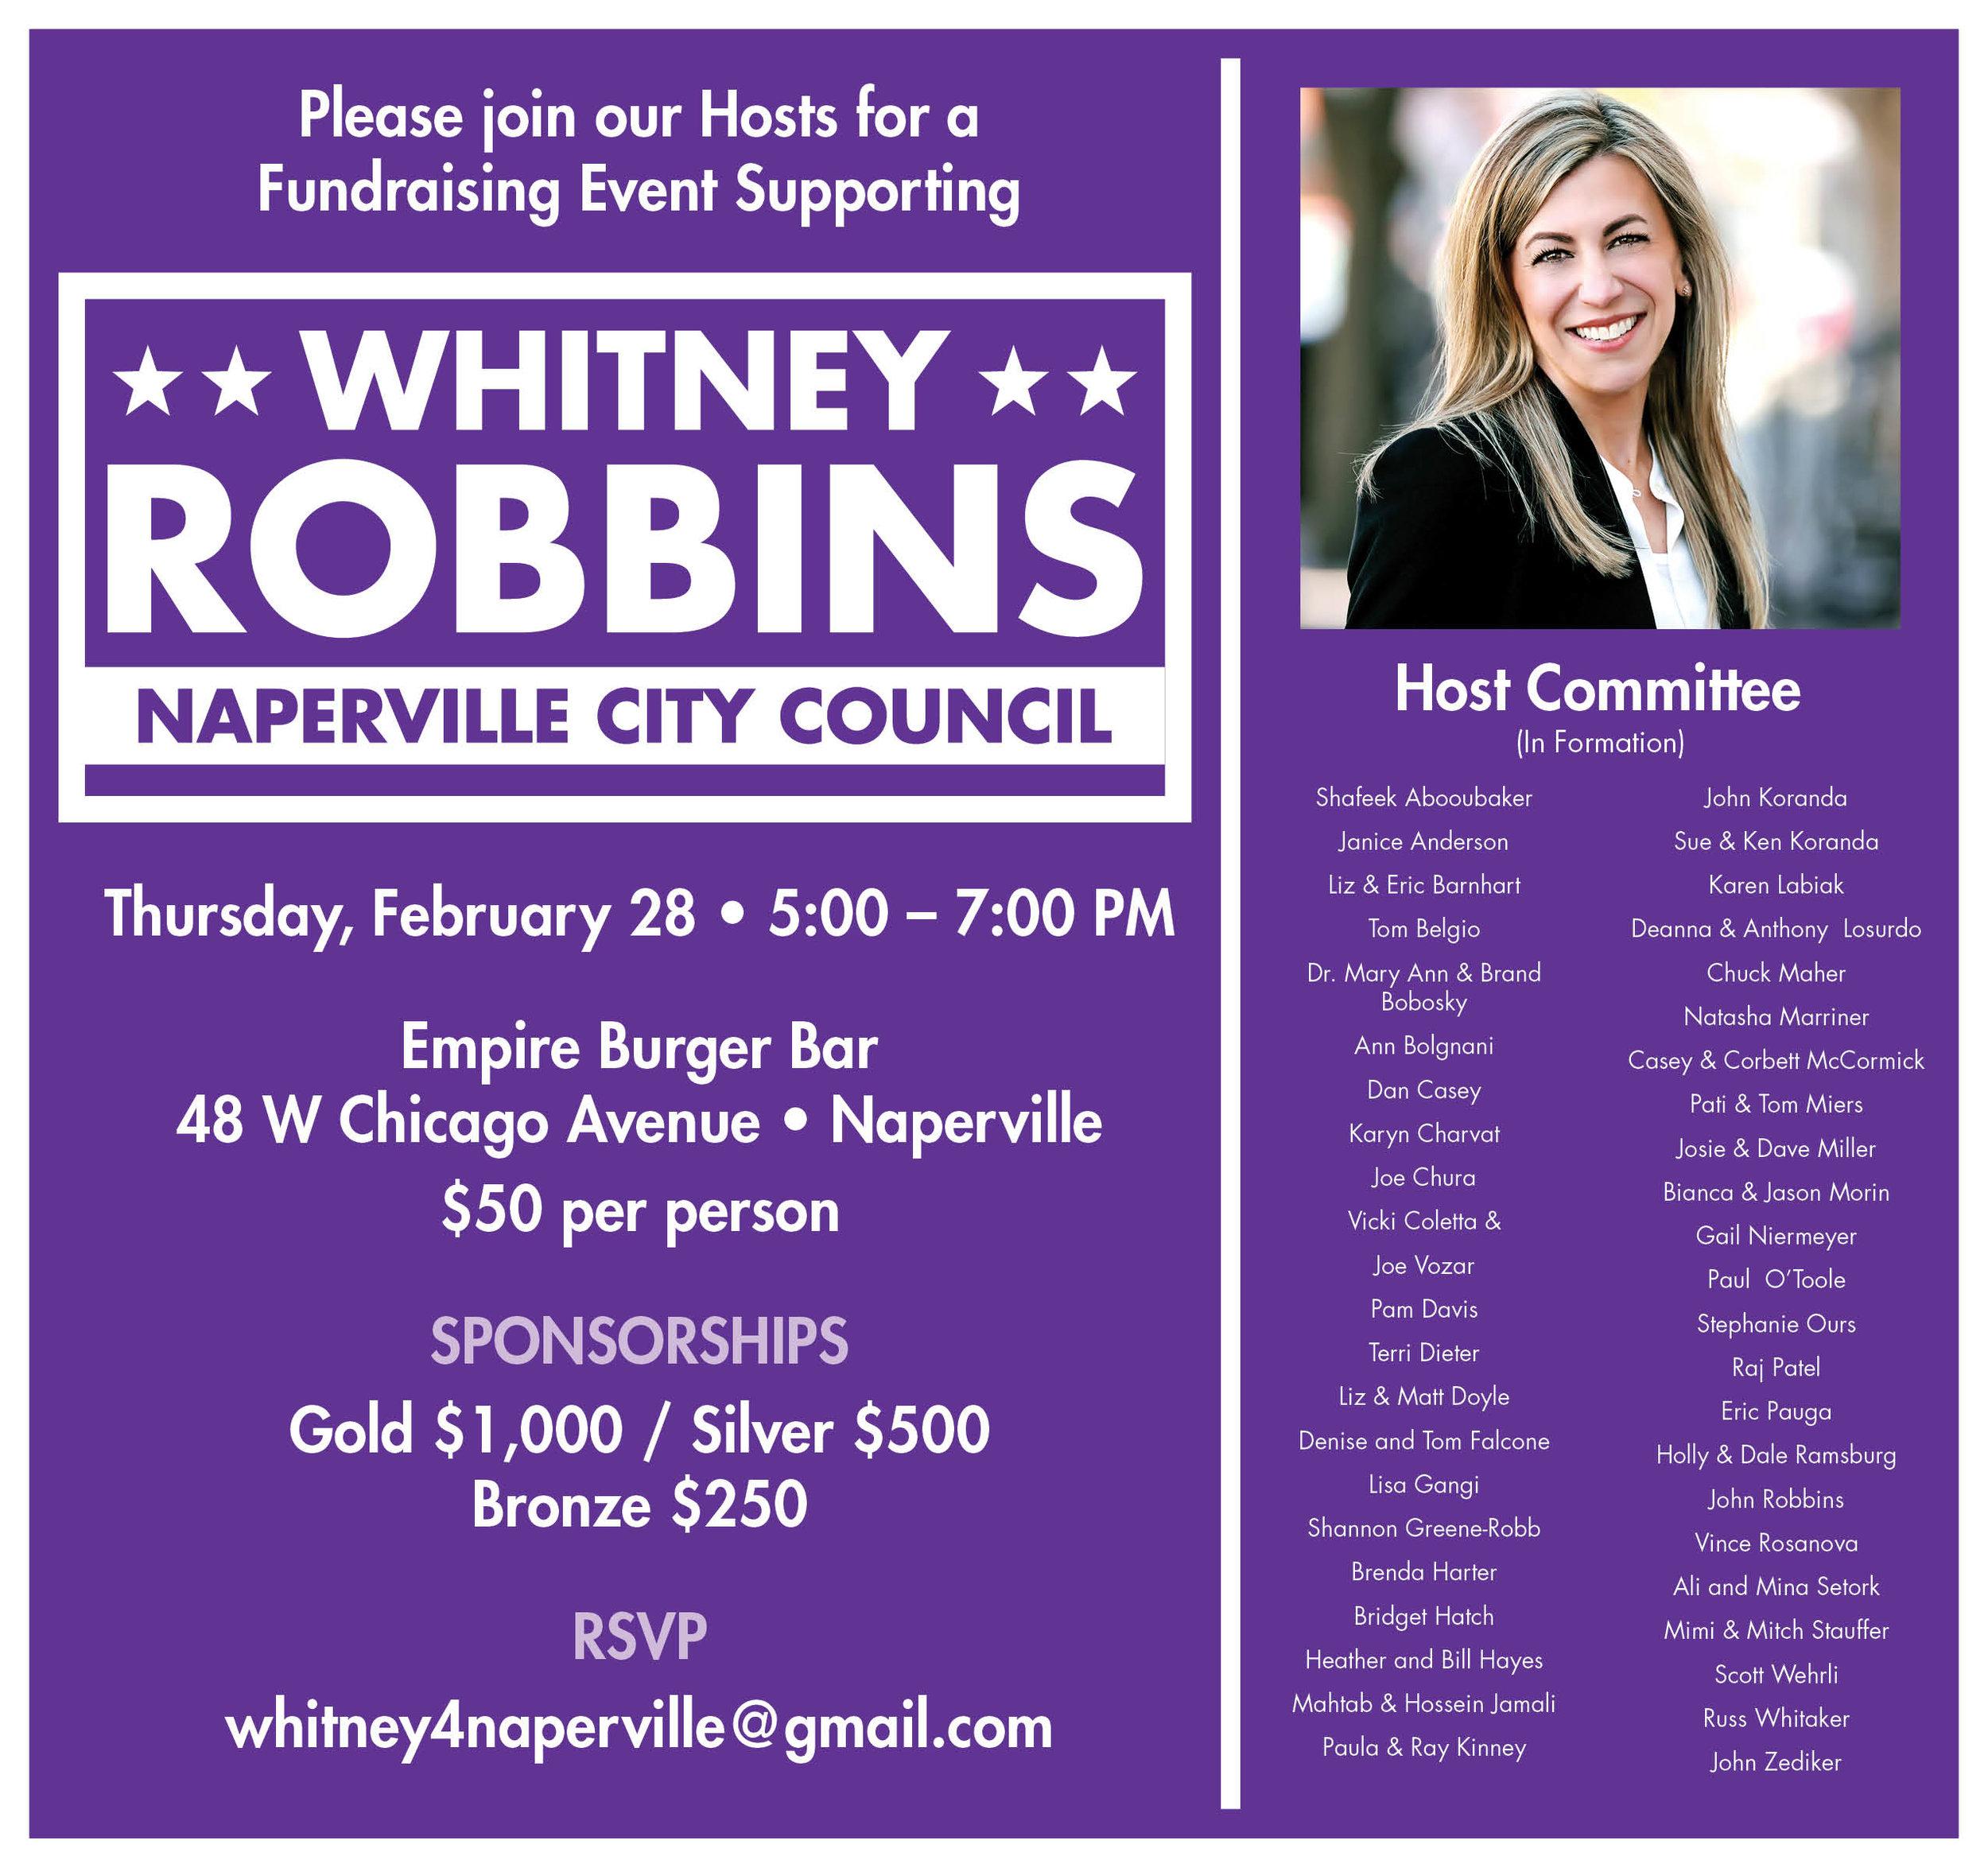 Whitney Robbins Event Invitation - 2_28_19 REV2 - WEB.jpg